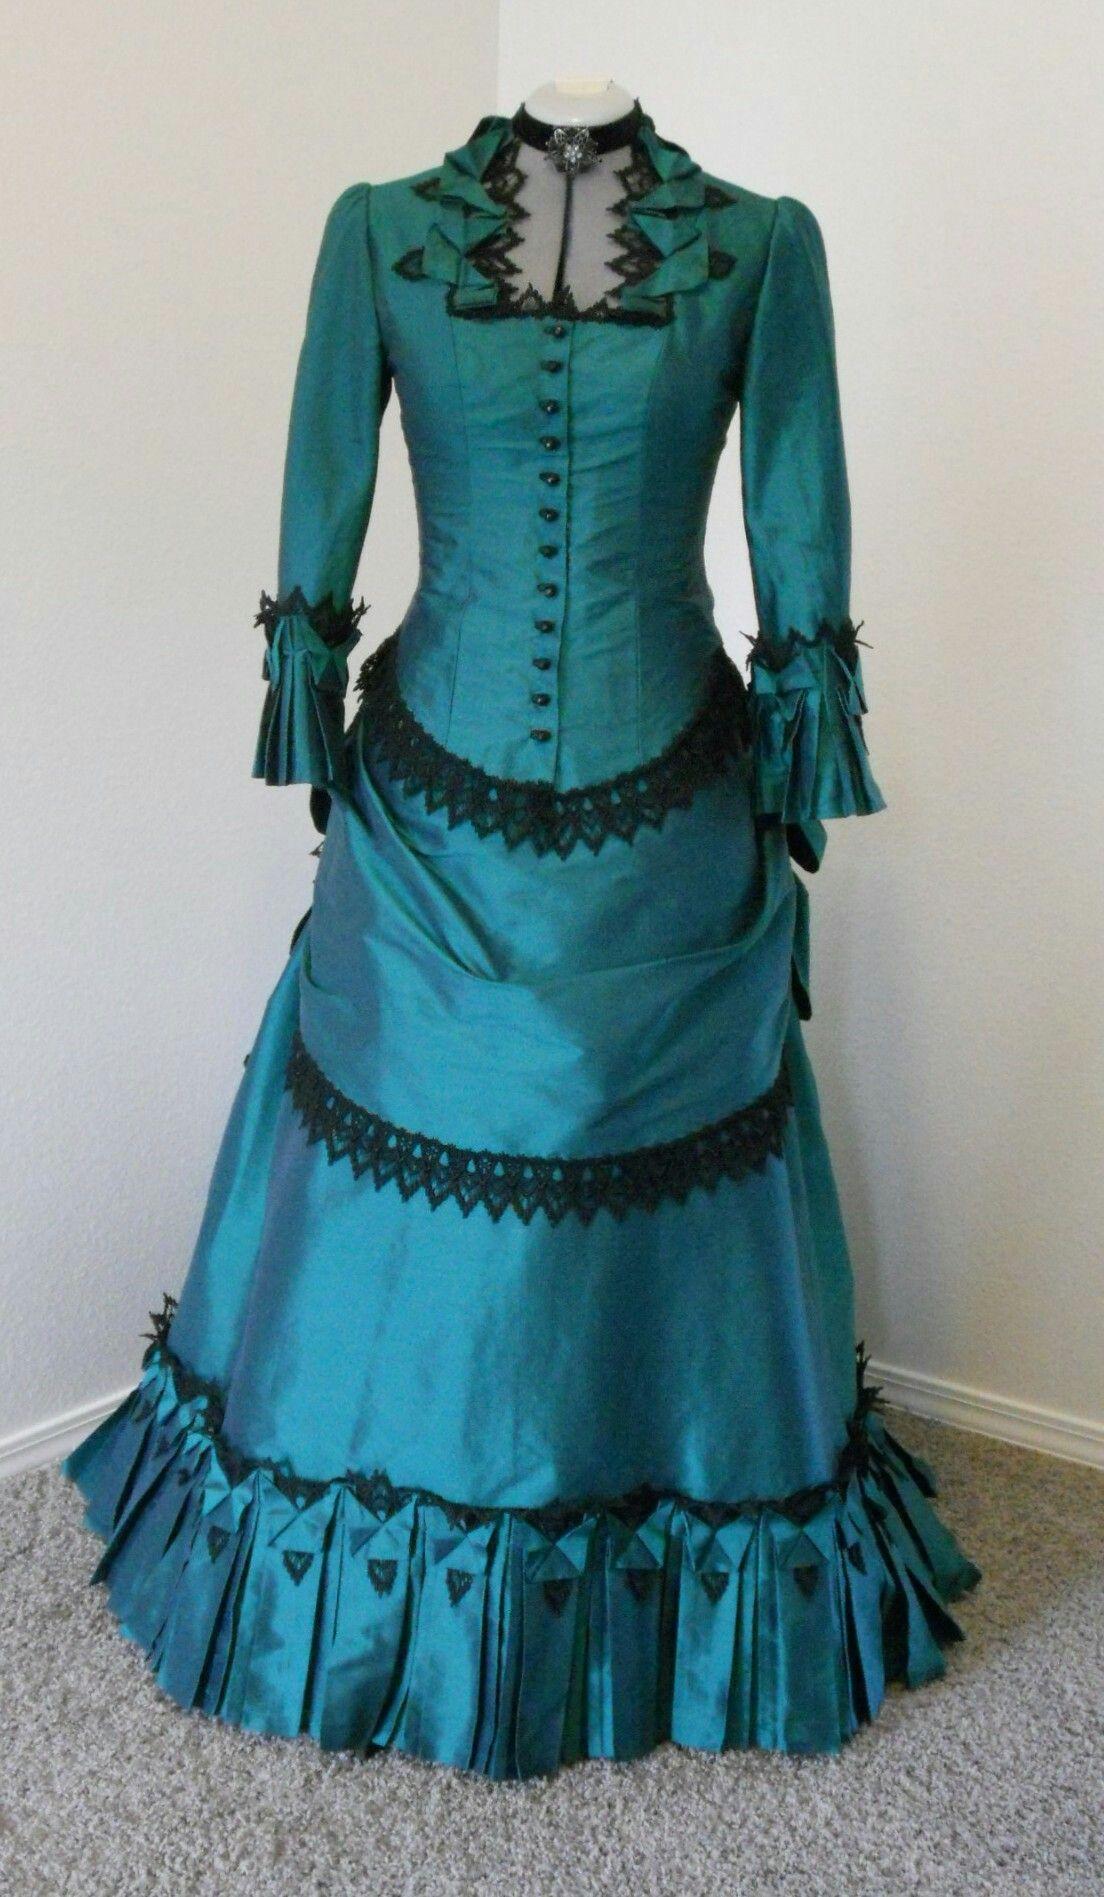 Pin by Katie Kern on Victorian & Edwardian Fashion   Pinterest ...